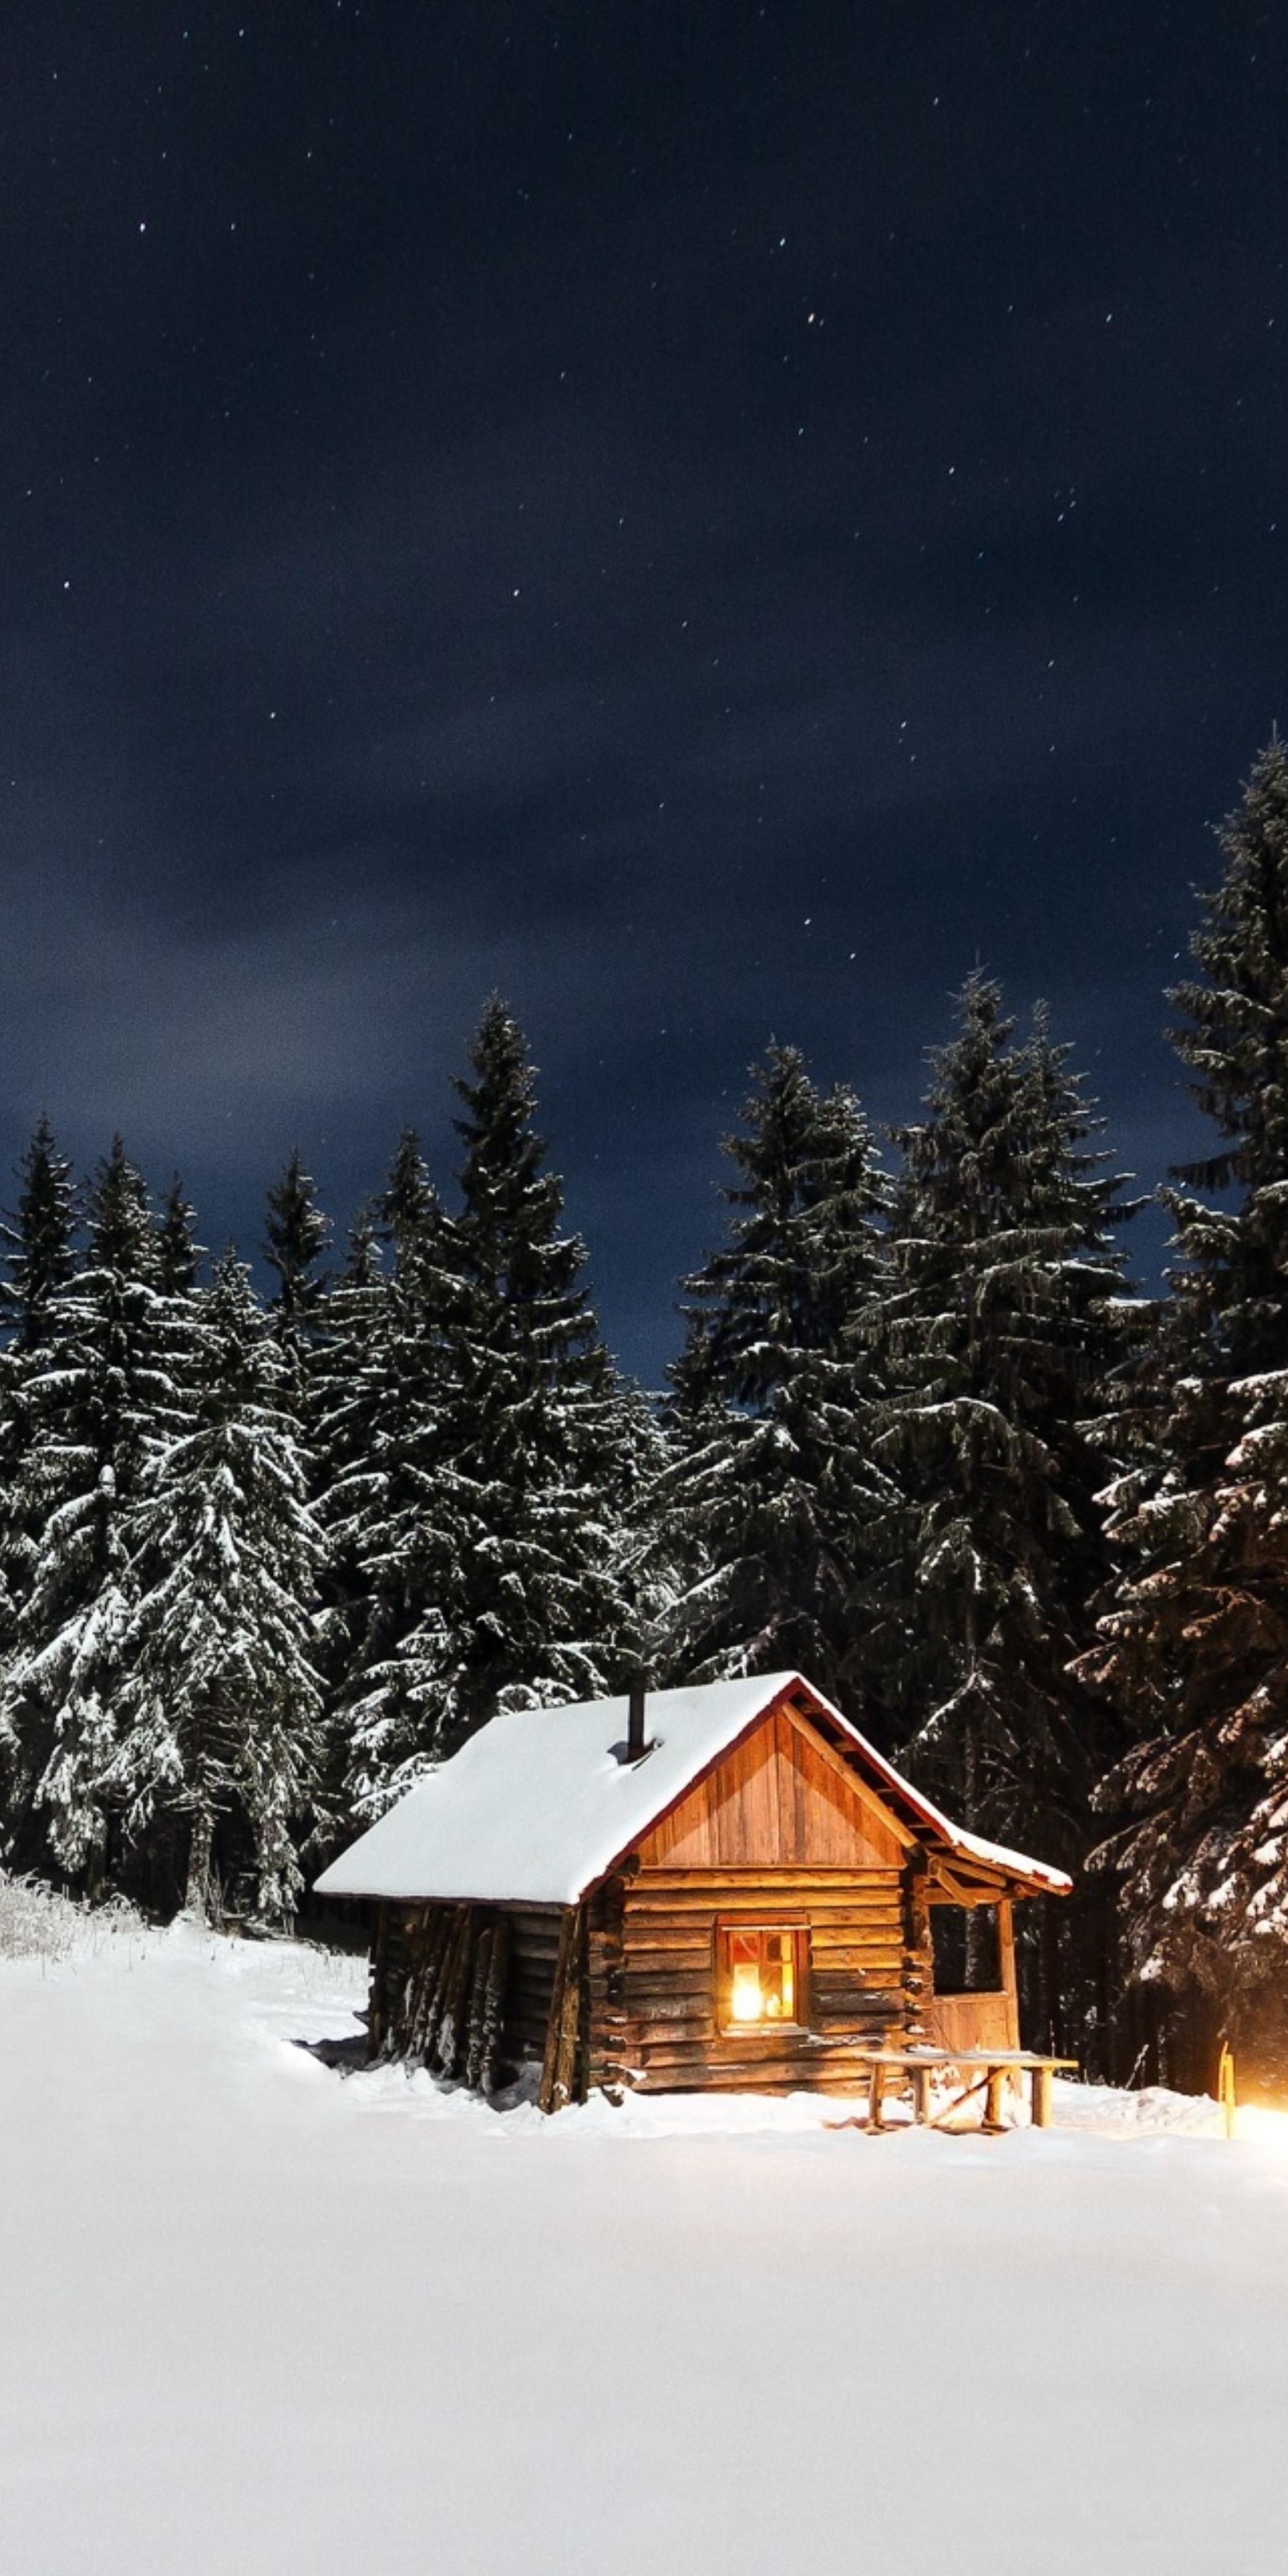 Best Winter Trips In The U S 21 Epic Locations In 2021 Winter House Iphone Wallpaper Winter Winter Wallpaper